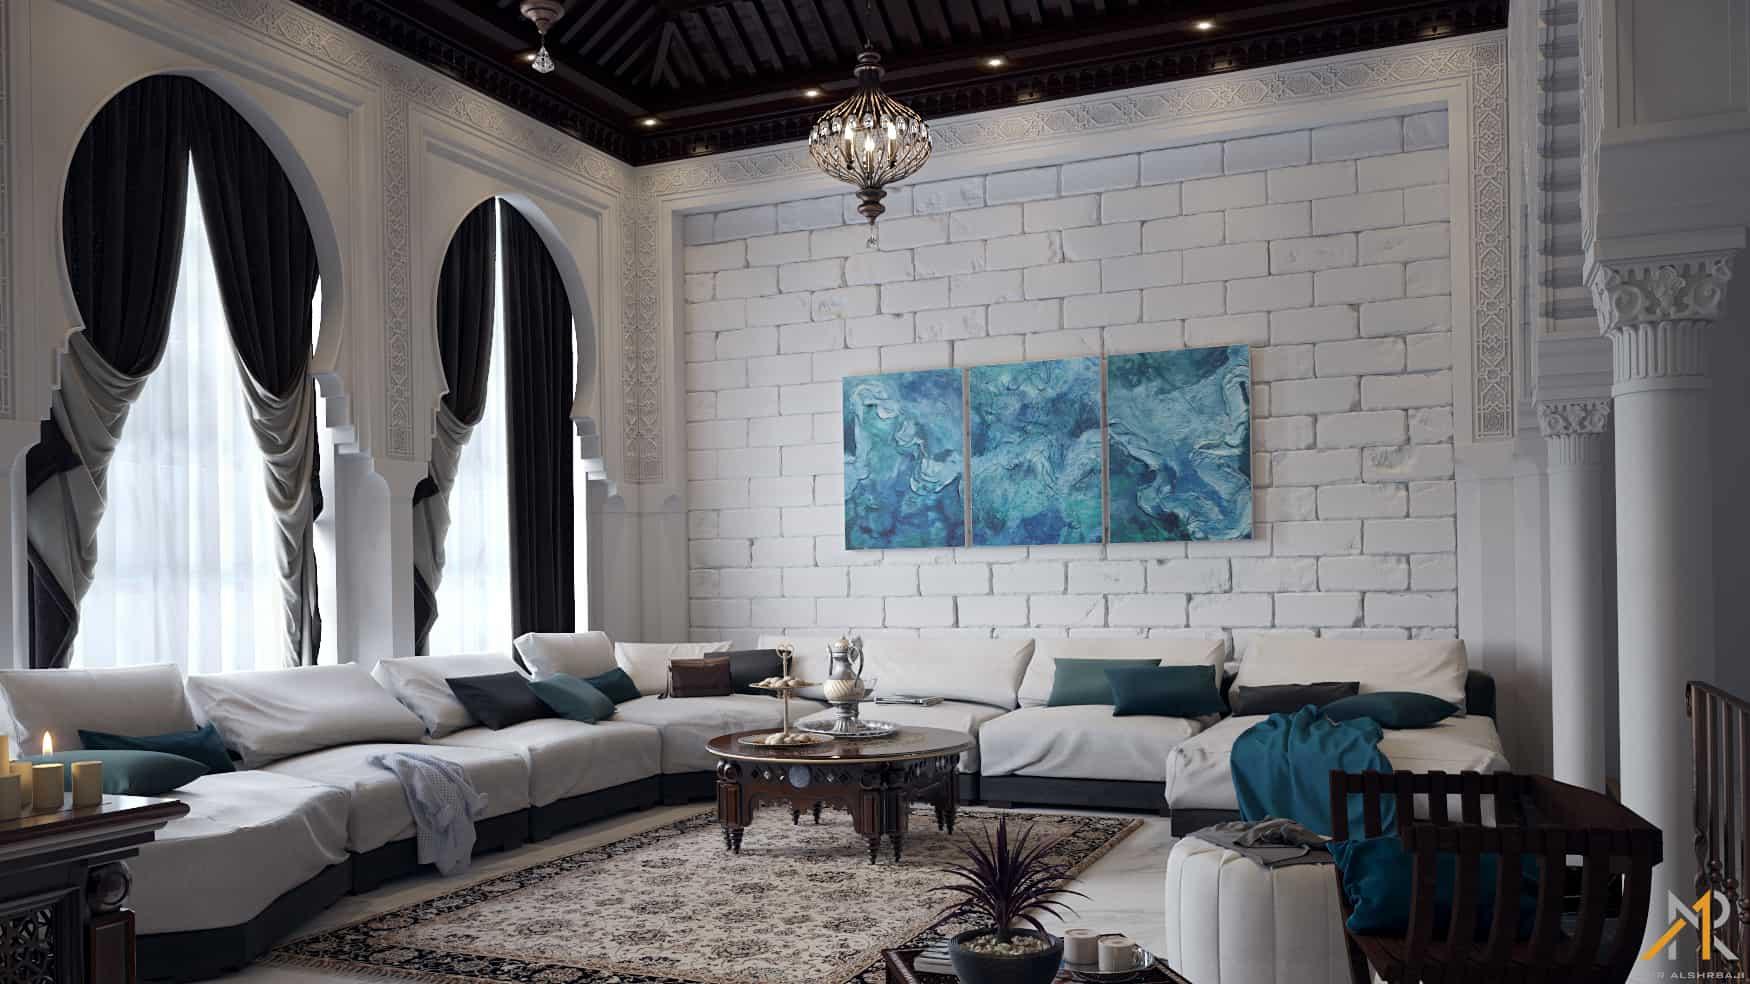 Harmony interior designio - Harmony in interior design ...